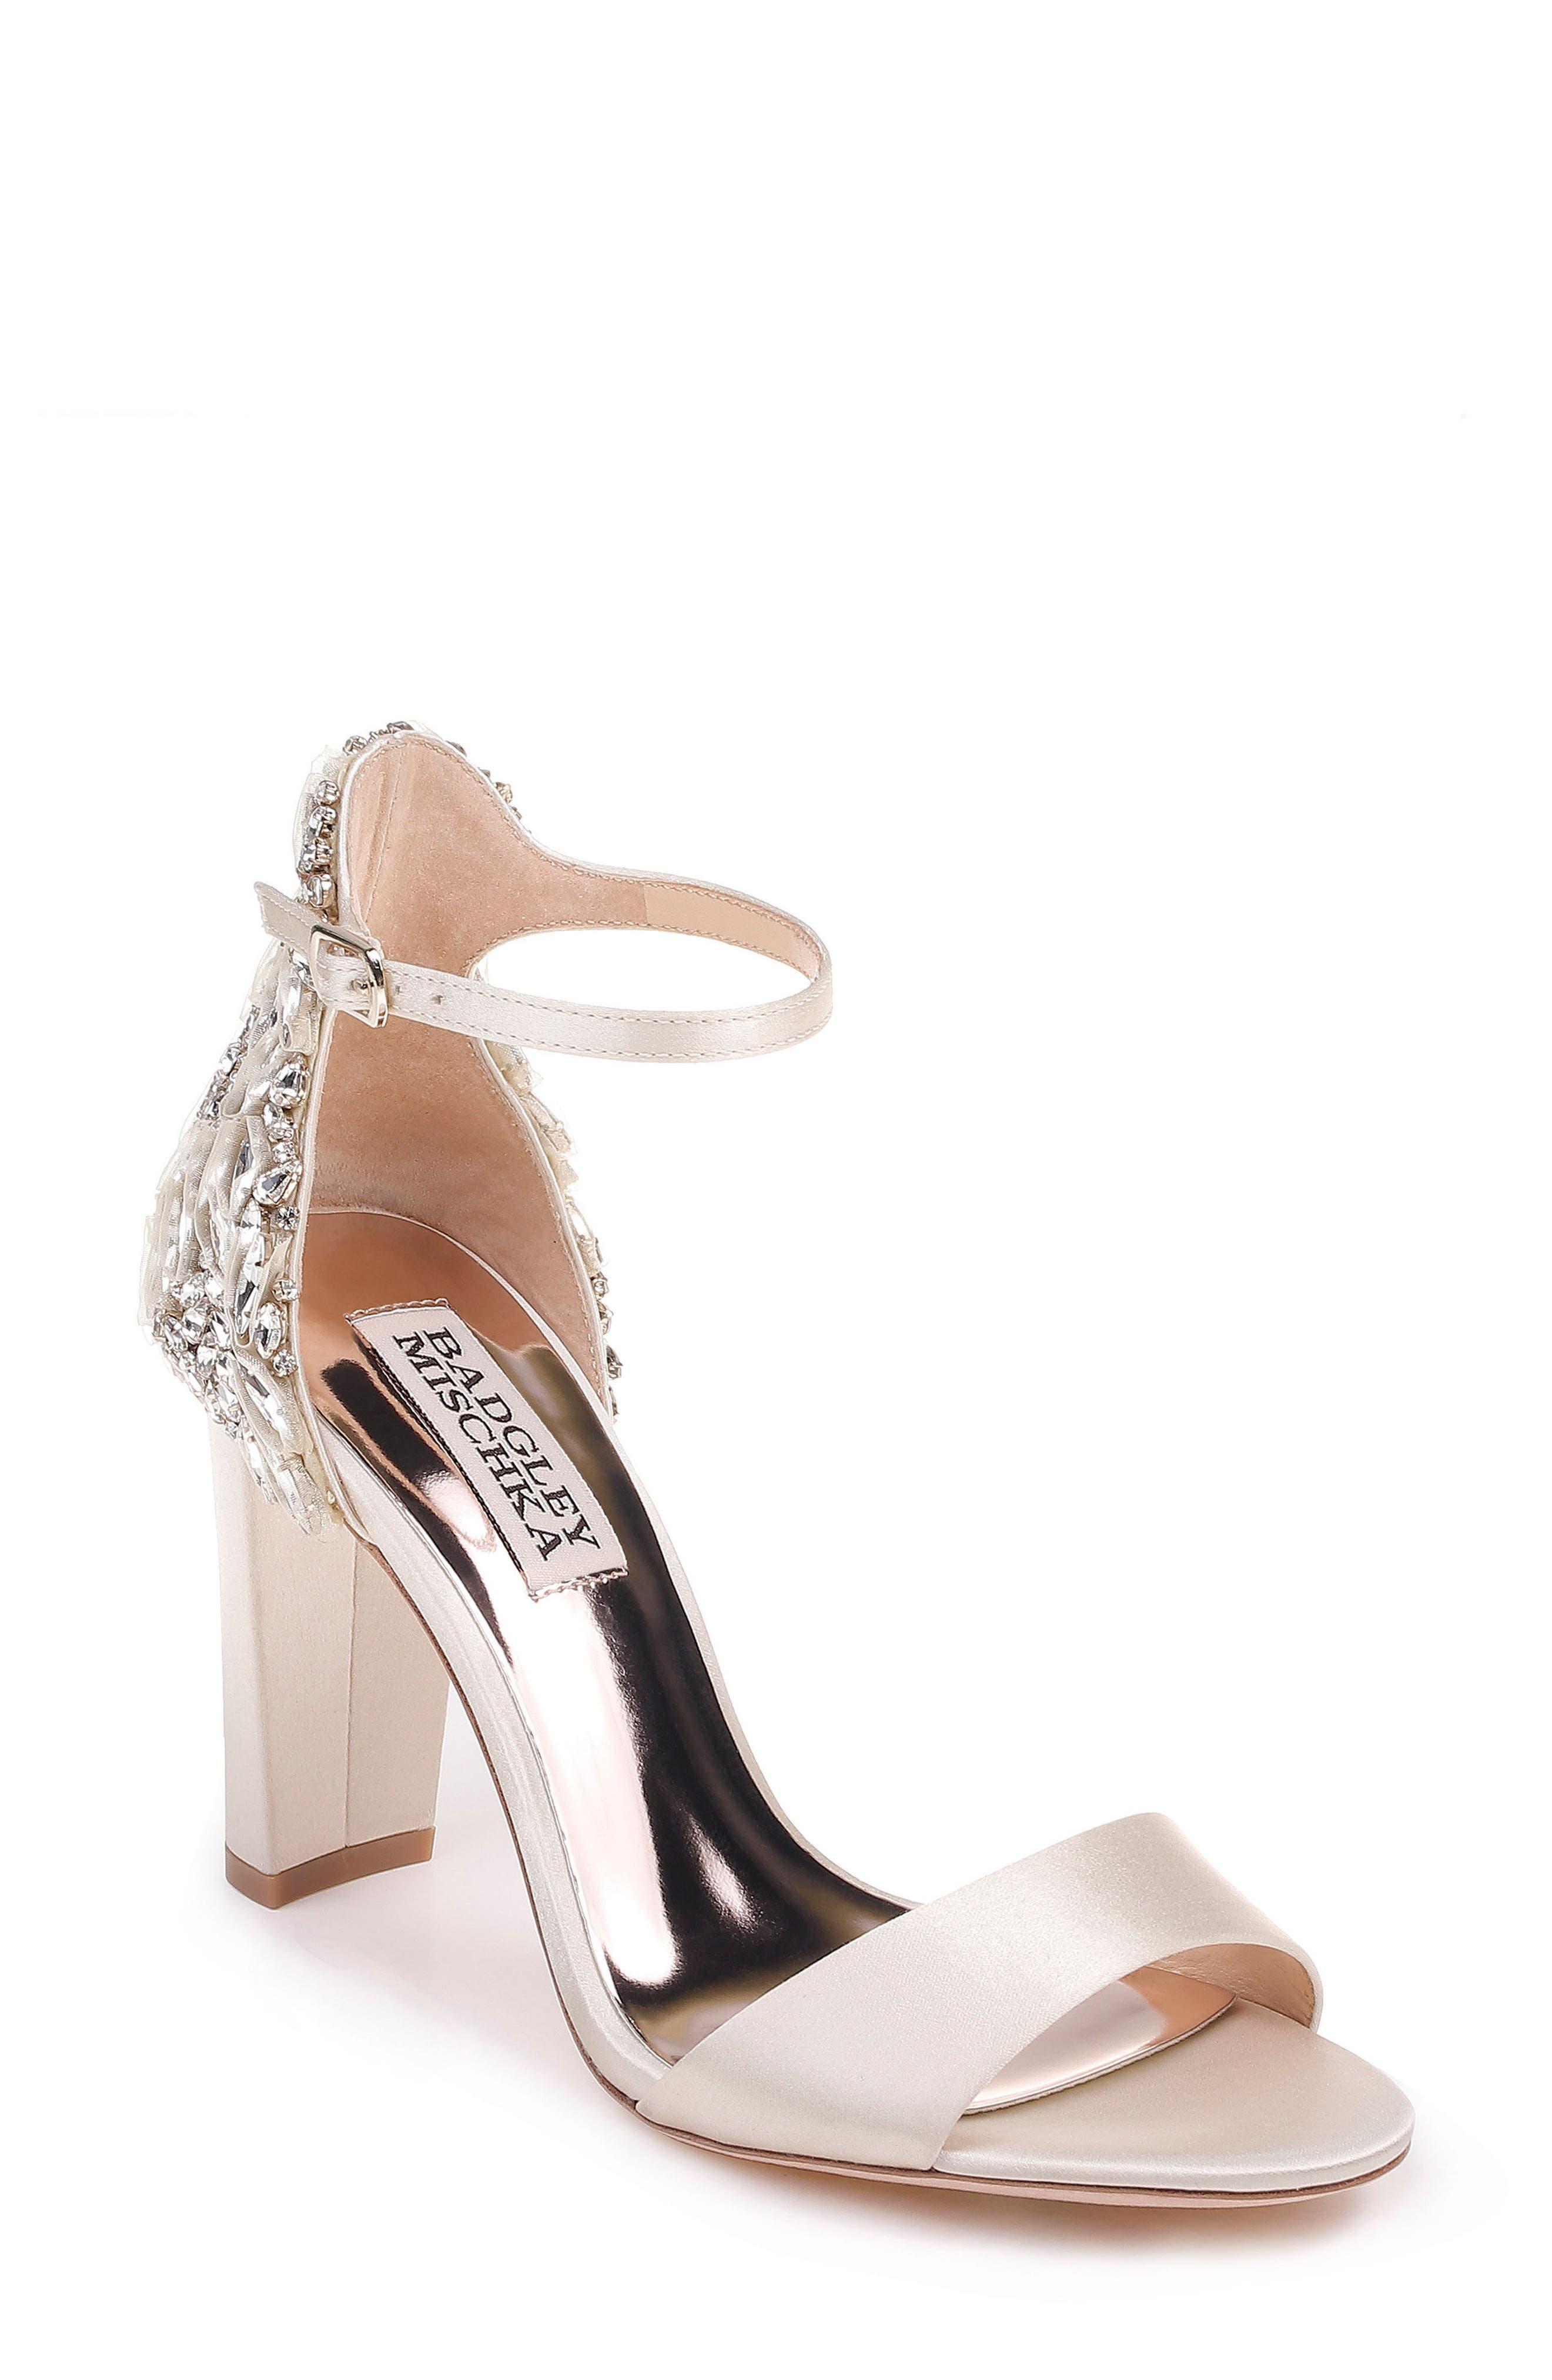 Main Image - Badgley Mischka Seina Ankle Strap Sandal (Women)